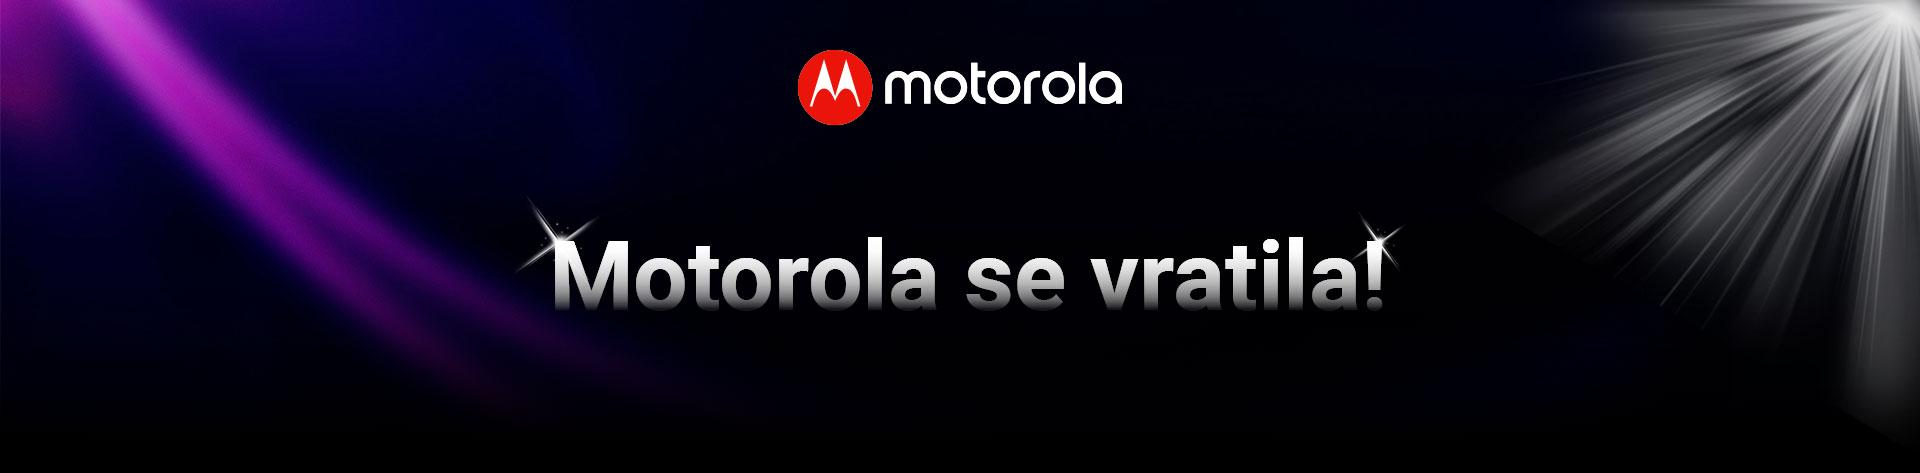 motorola-se-vratila-header-bg-final